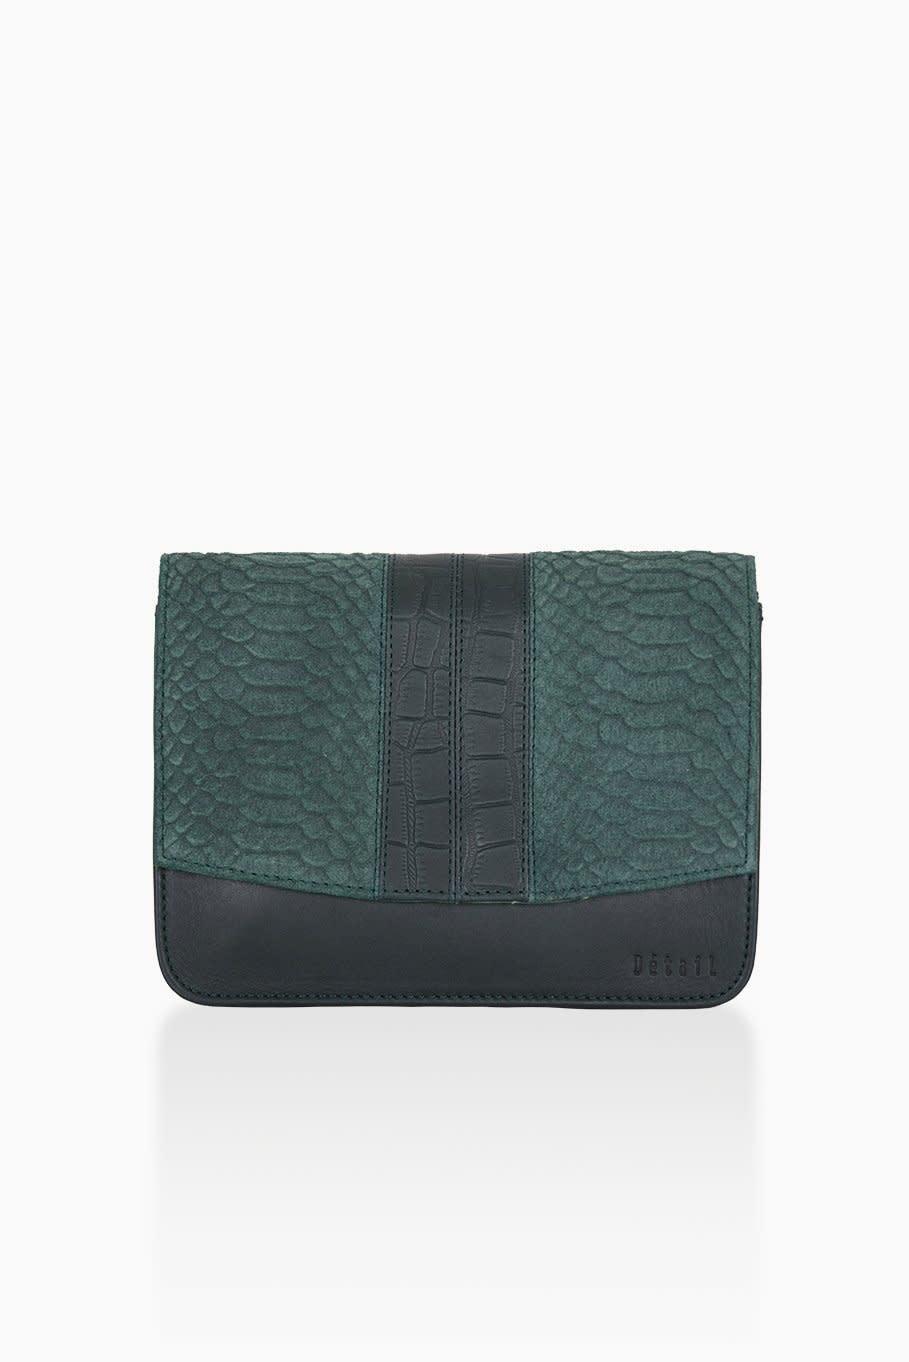 Détail Detail Hope handbag Green anaconda 21 x 7 x 15 cm